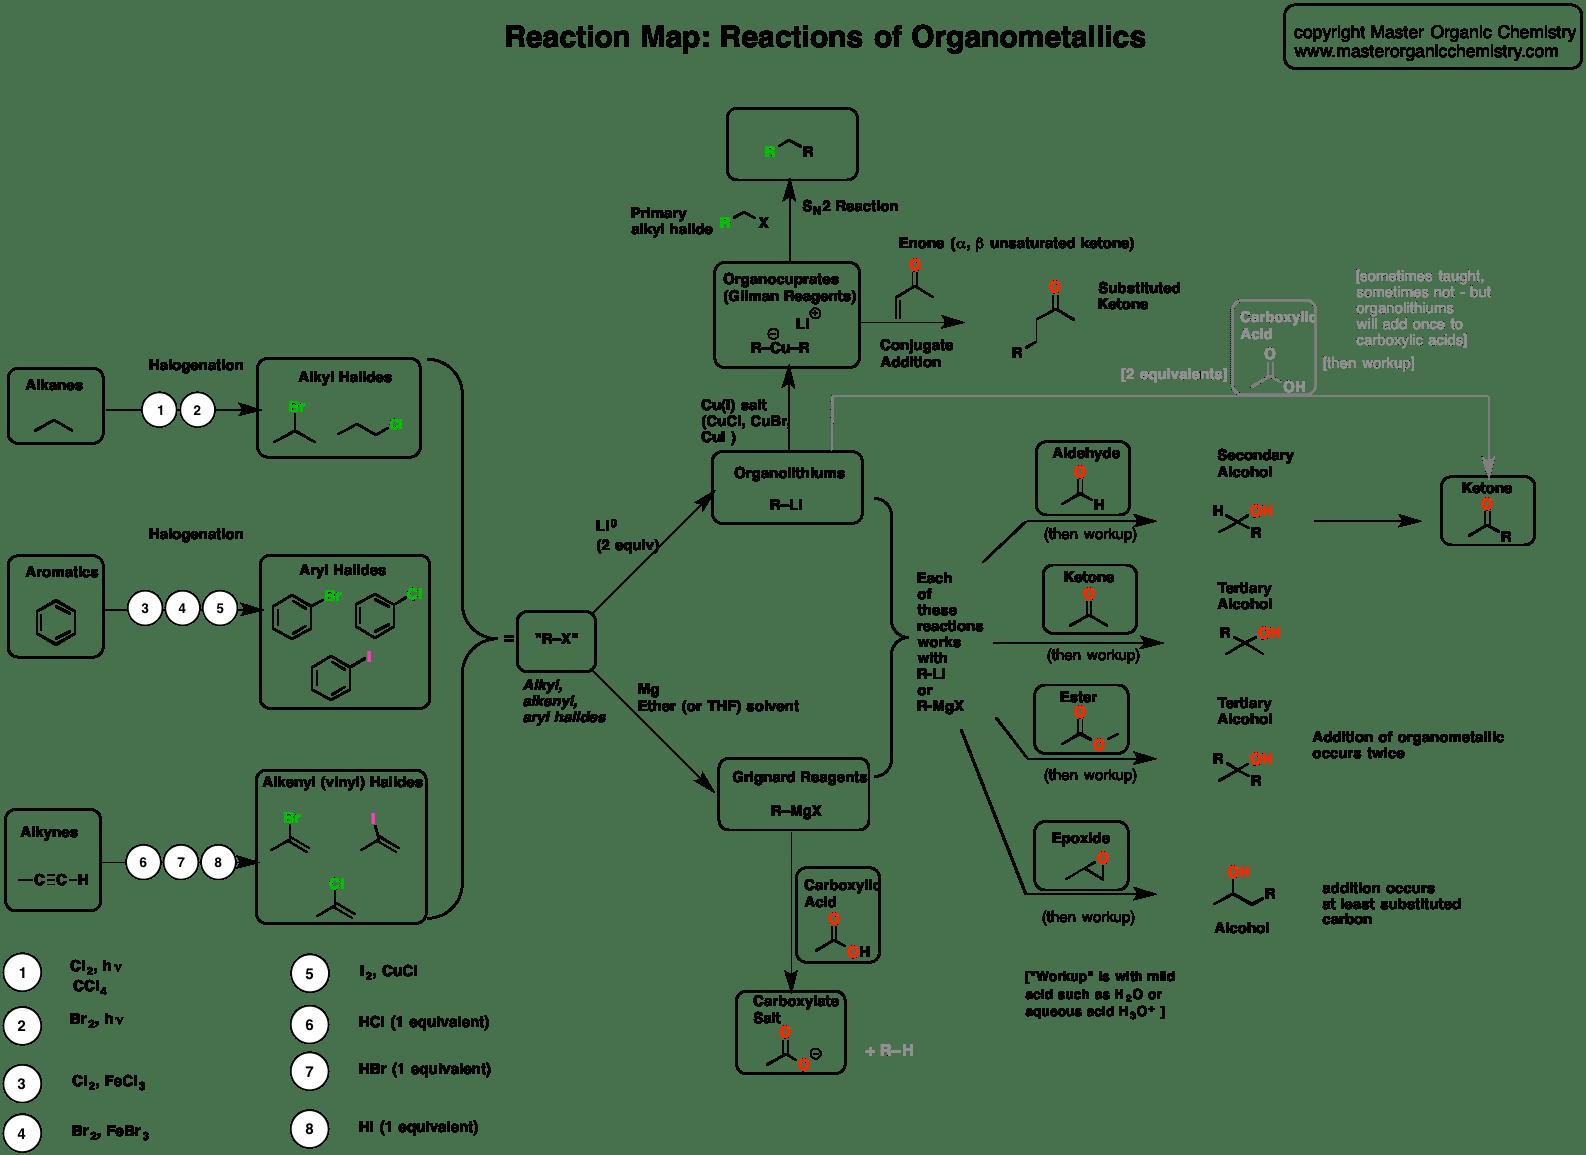 hight resolution of reaction map organometallics